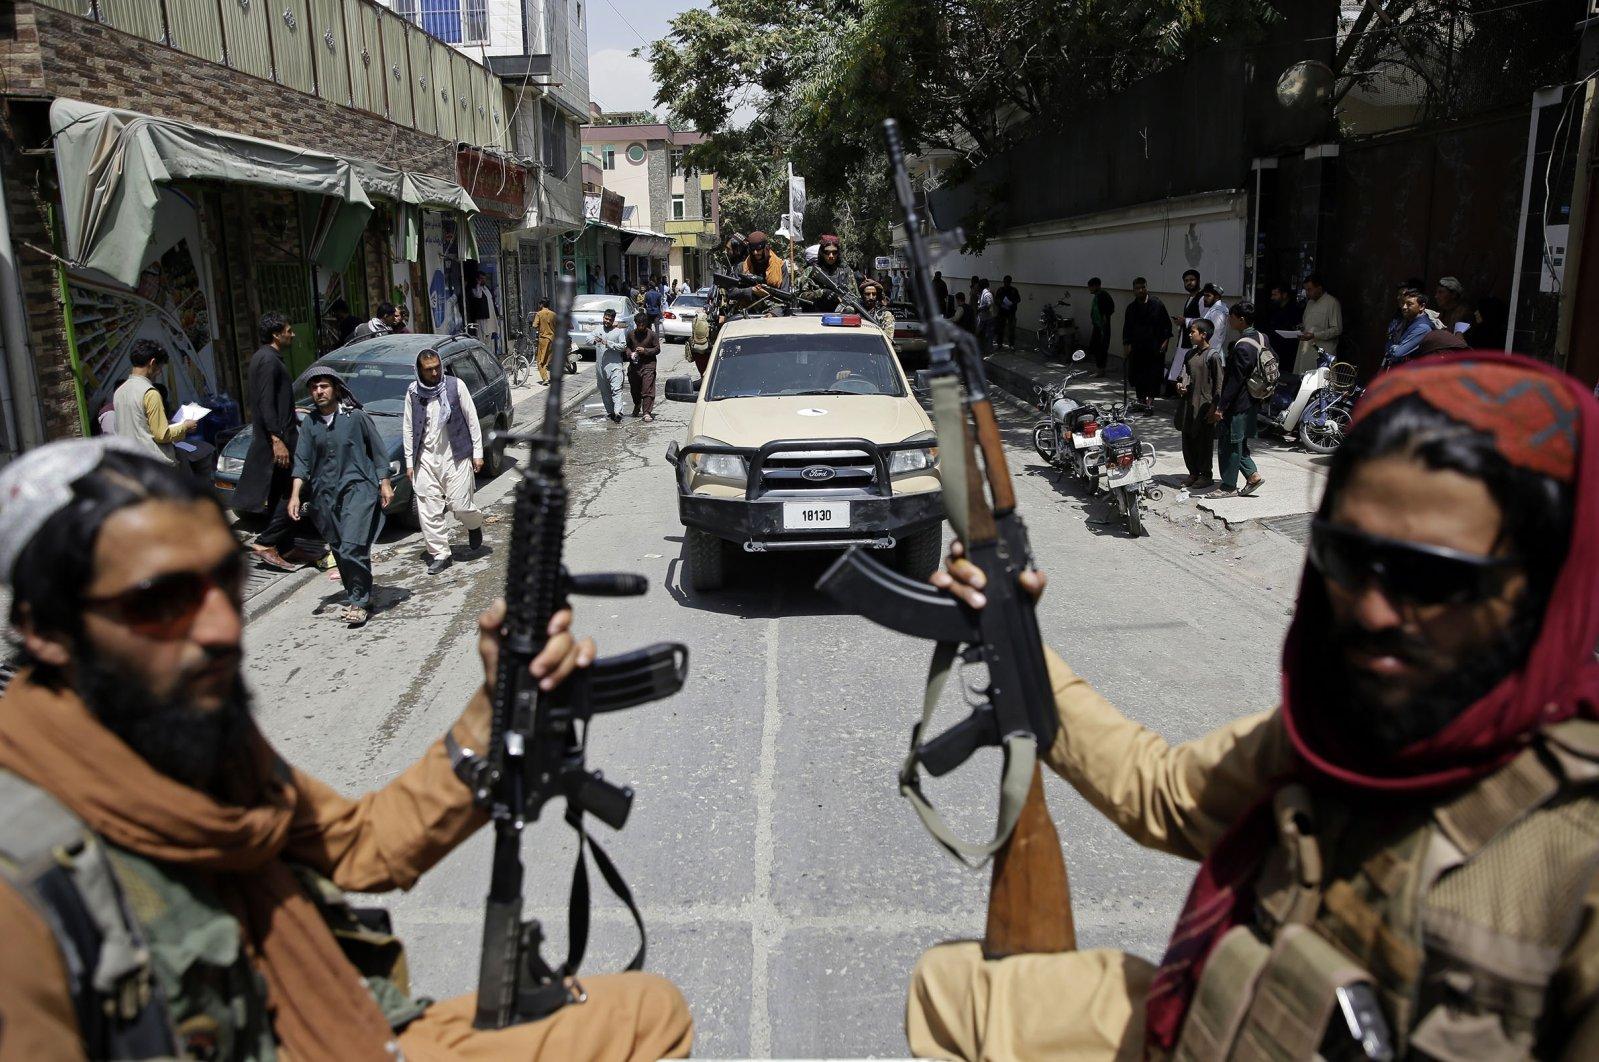 Taliban fighters patrol Kabul, Afghanistan, Aug. 19, 2021. (AP Photo)